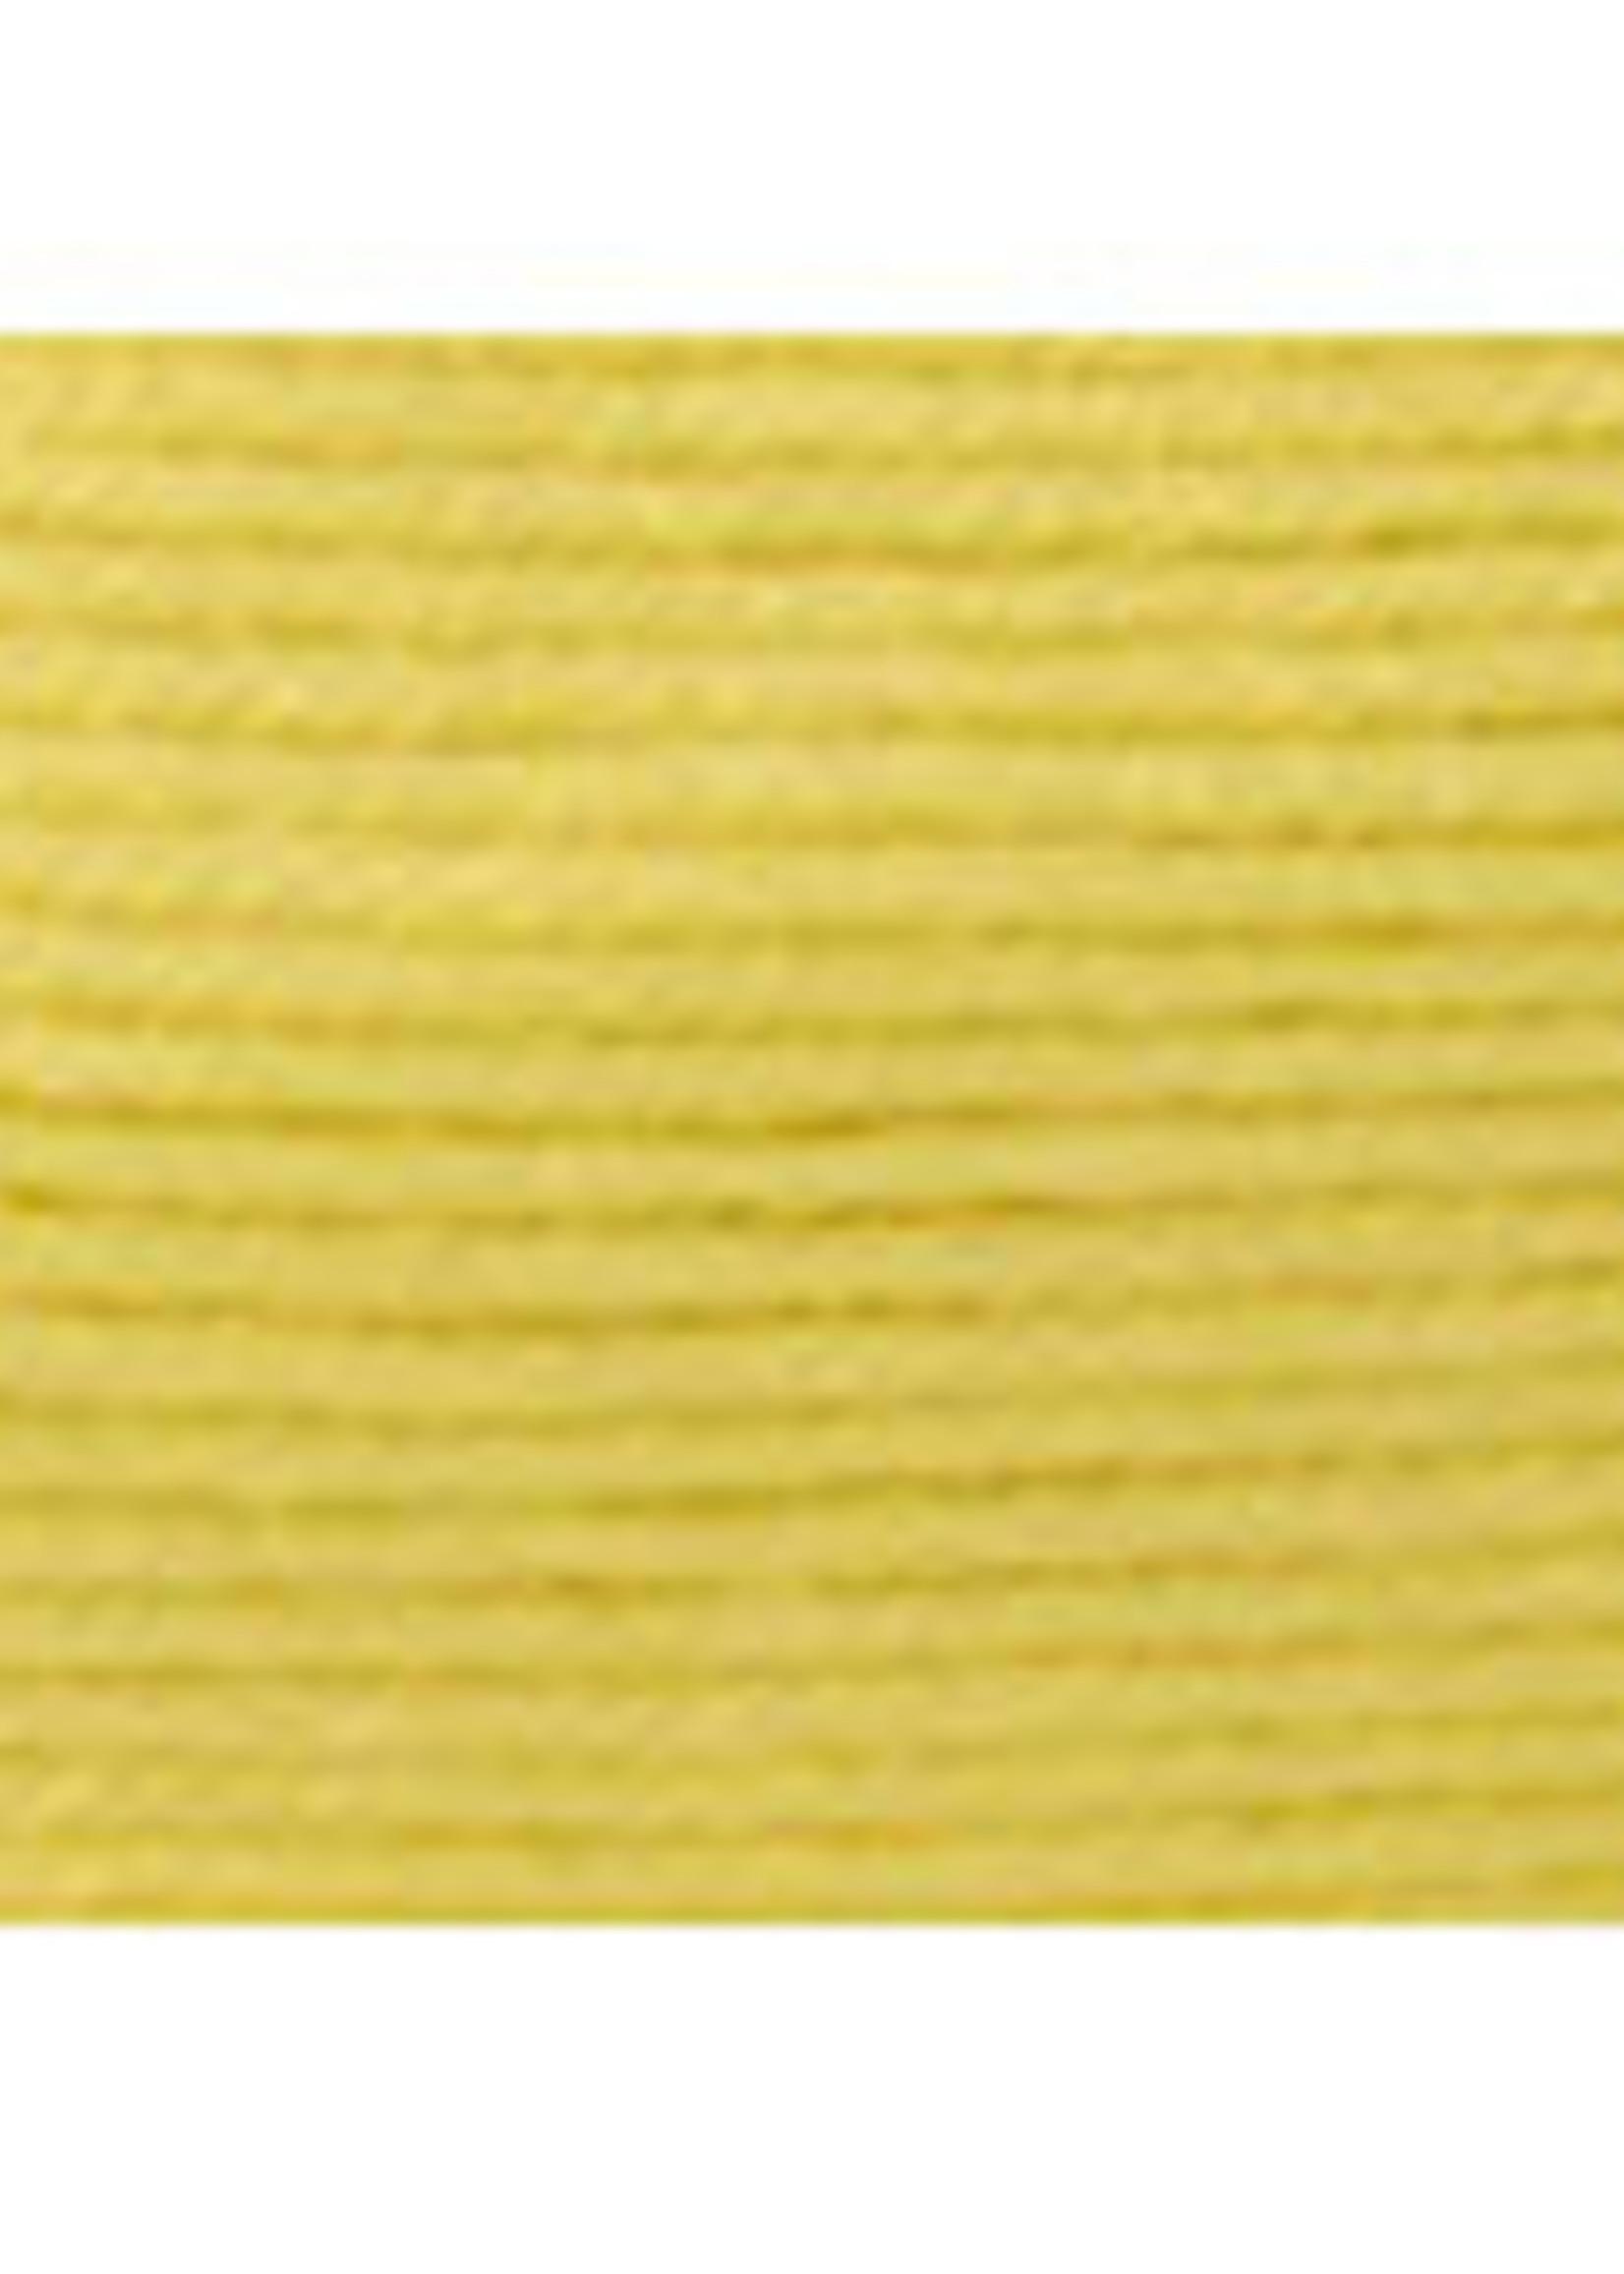 Universal Yarns Universal Yarn Uptown Worsted 304 Baby Yellow